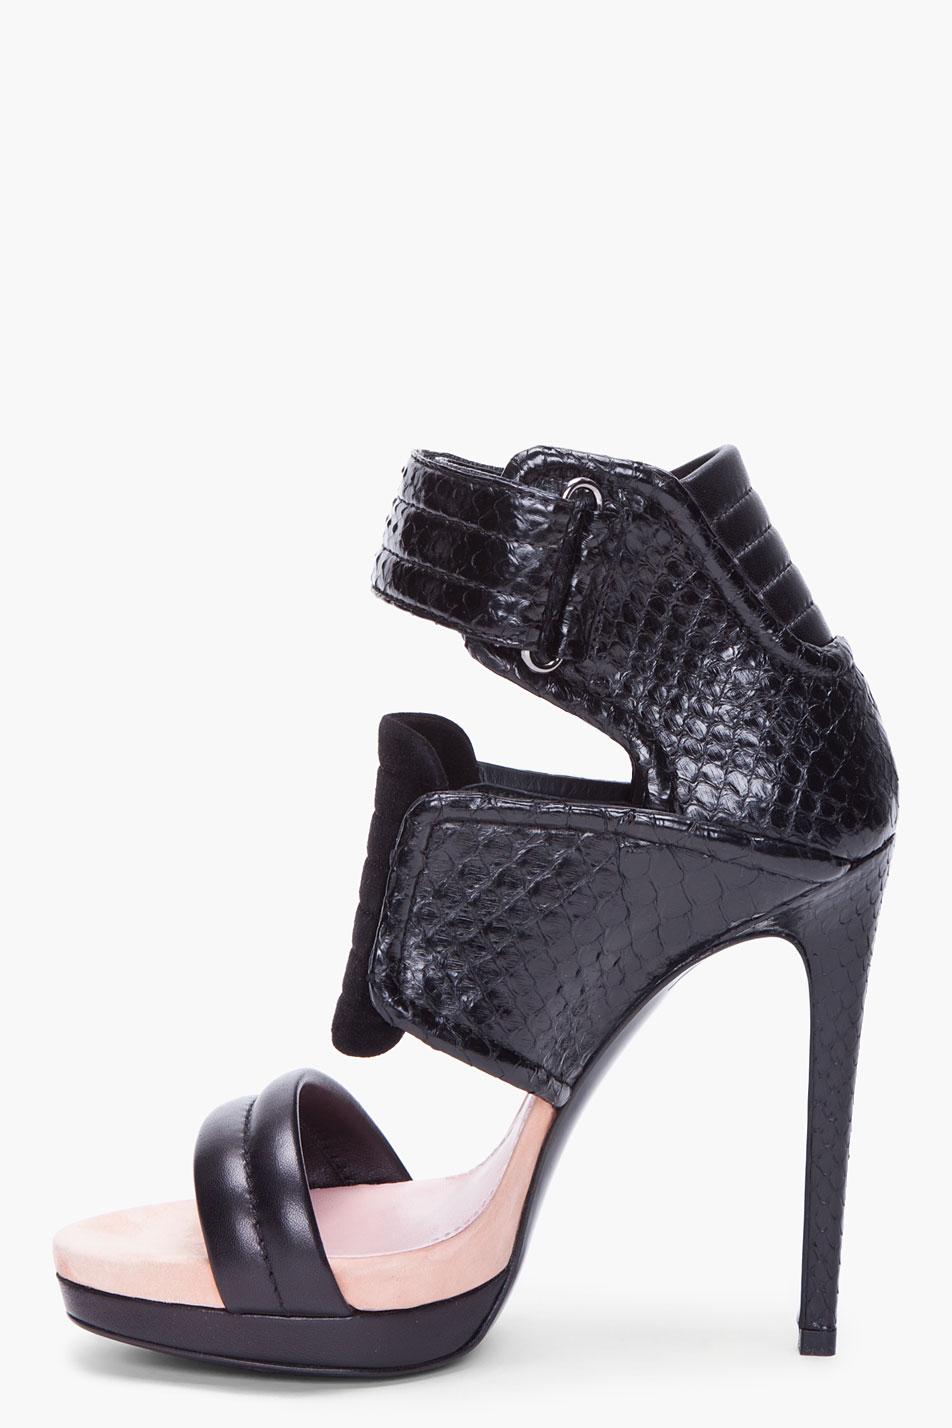 BARBARA BUI Leather High Heel tqaqP